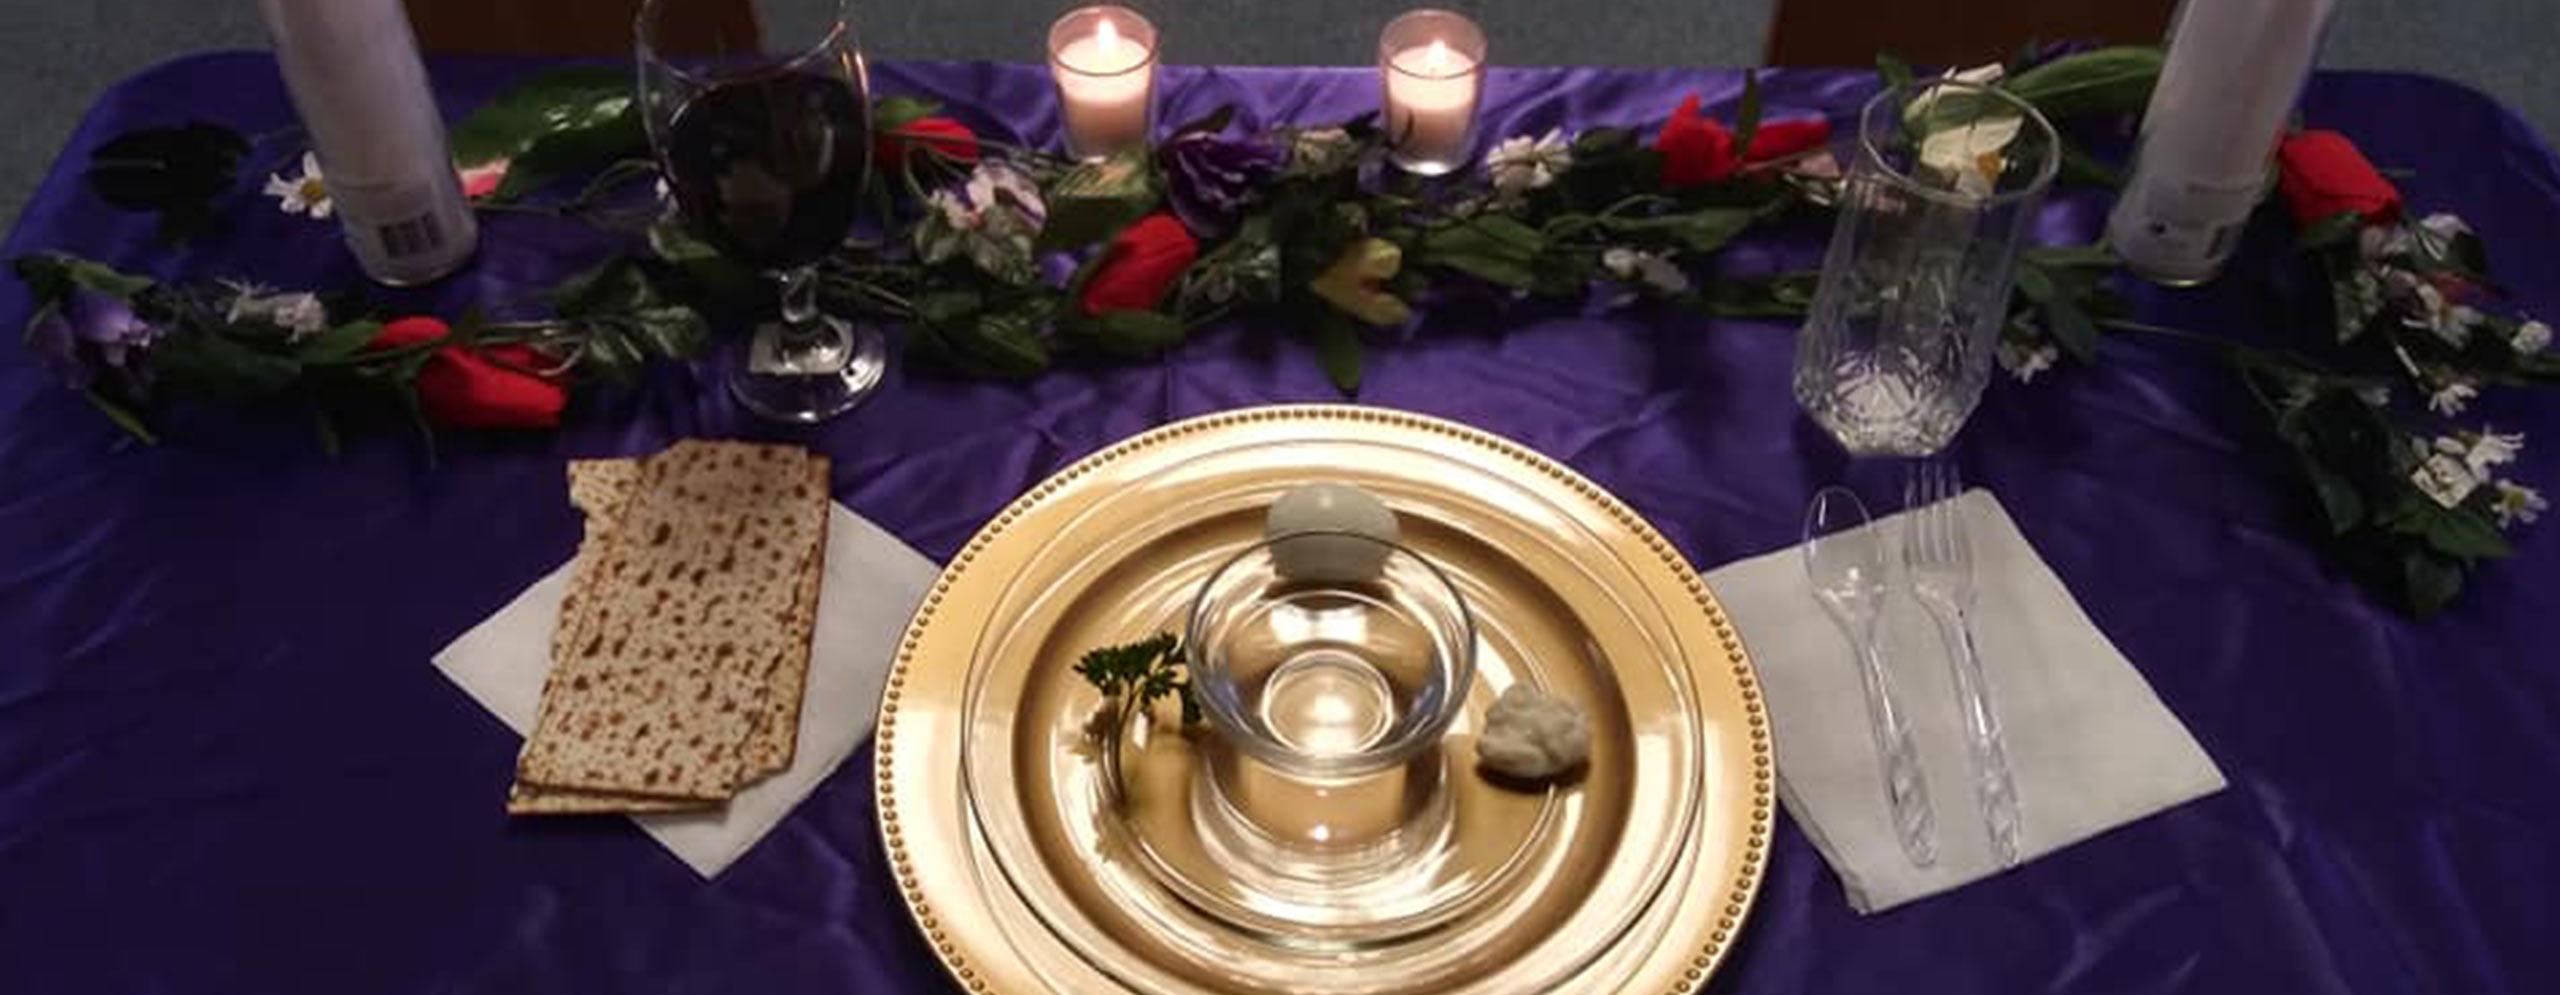 Maundy Thursday Seder Supper